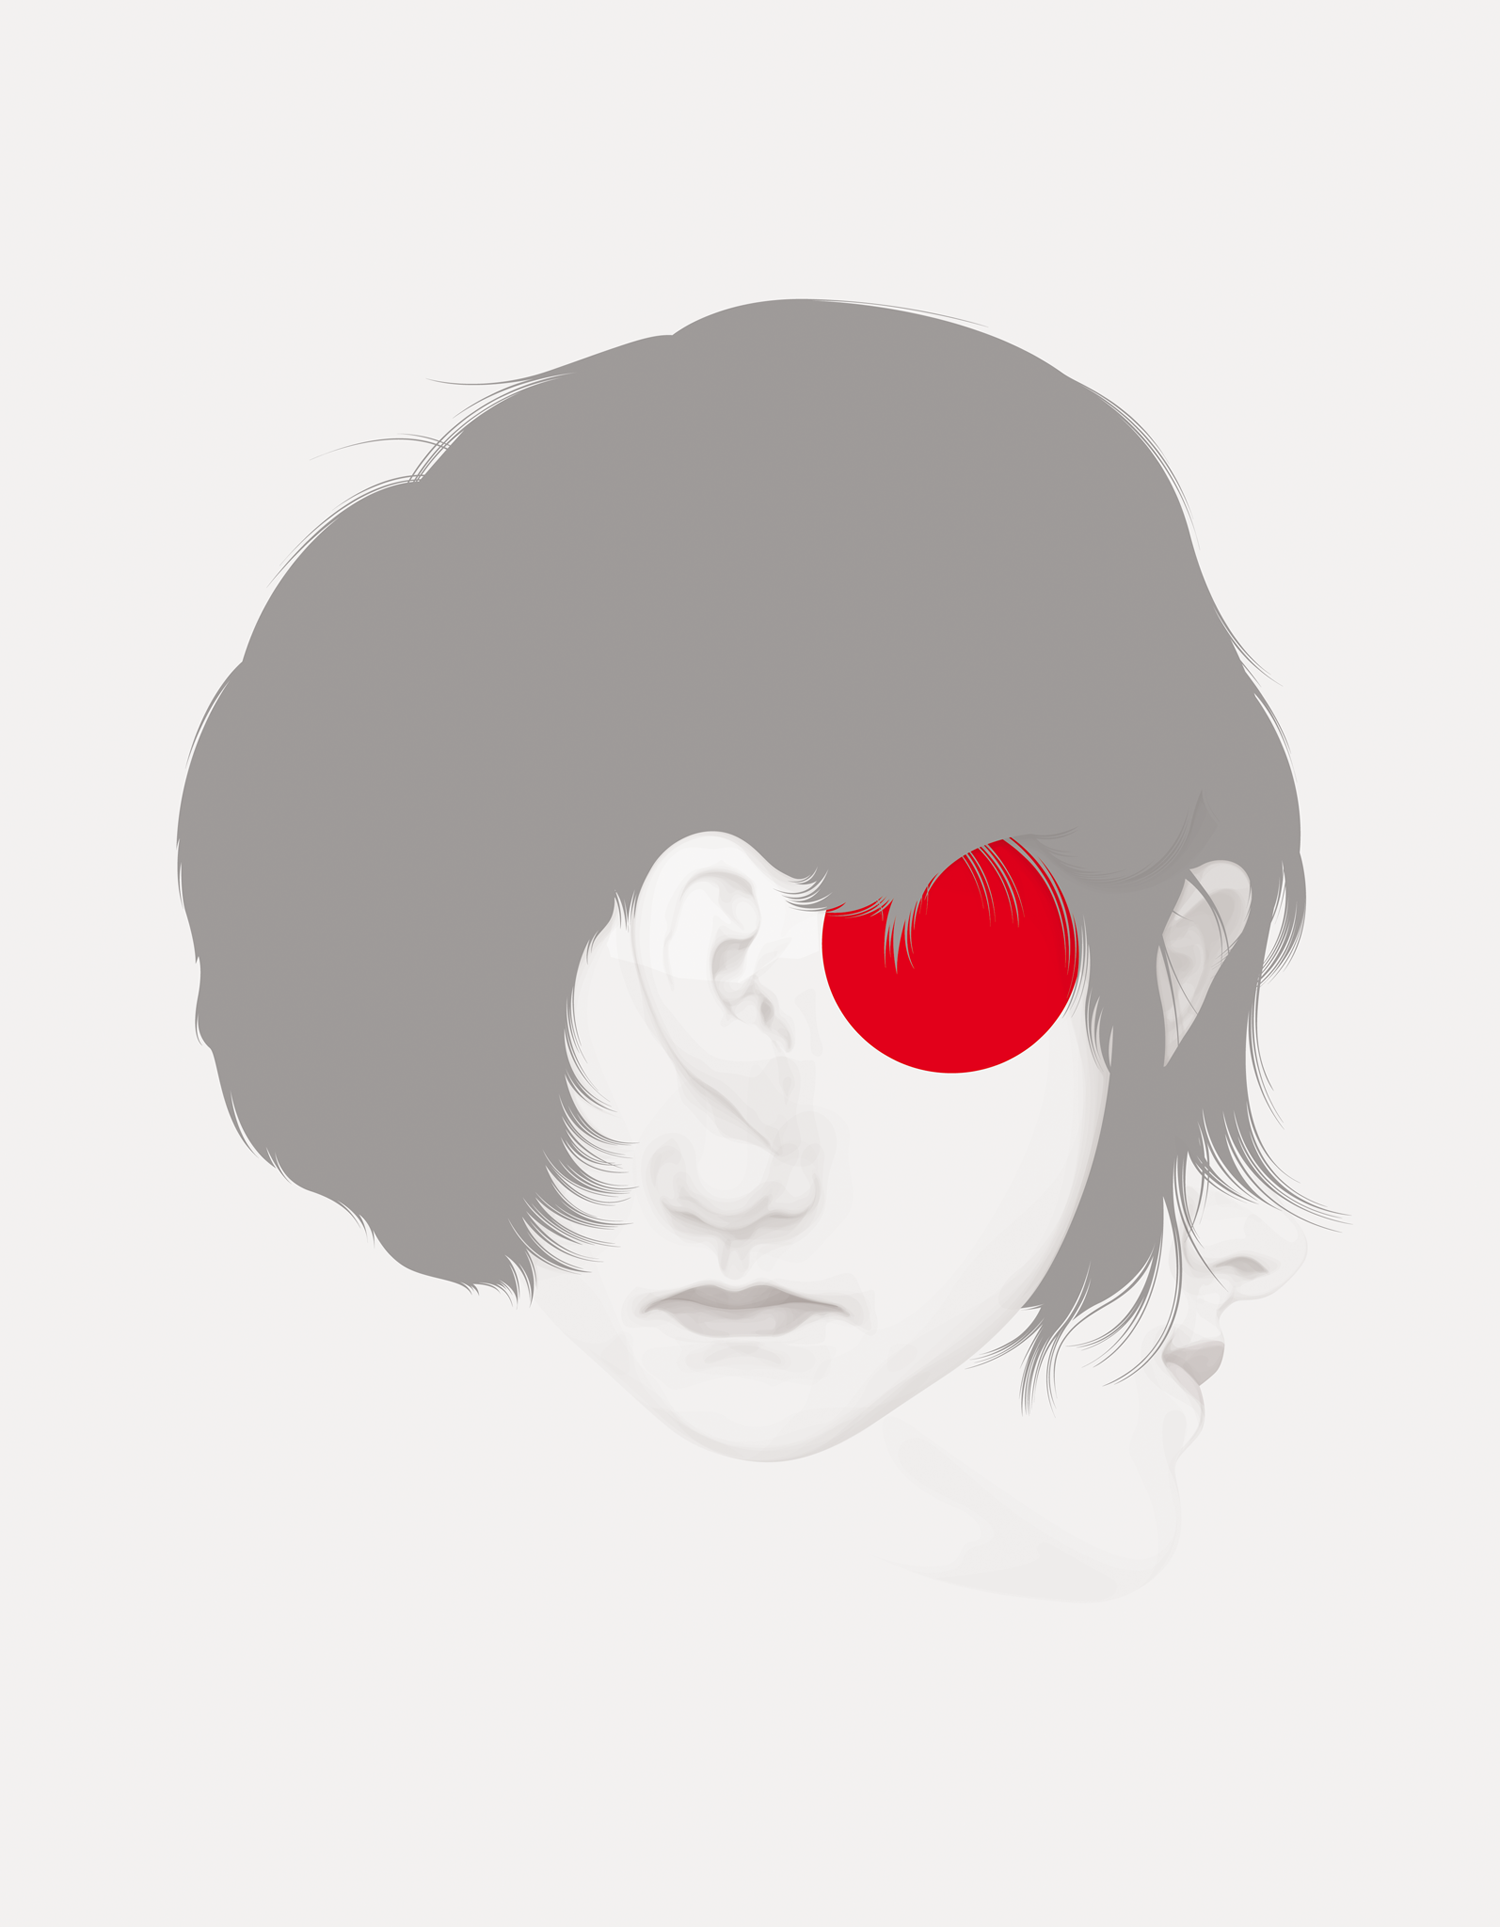 bruise_julesjulien_1500_03.png